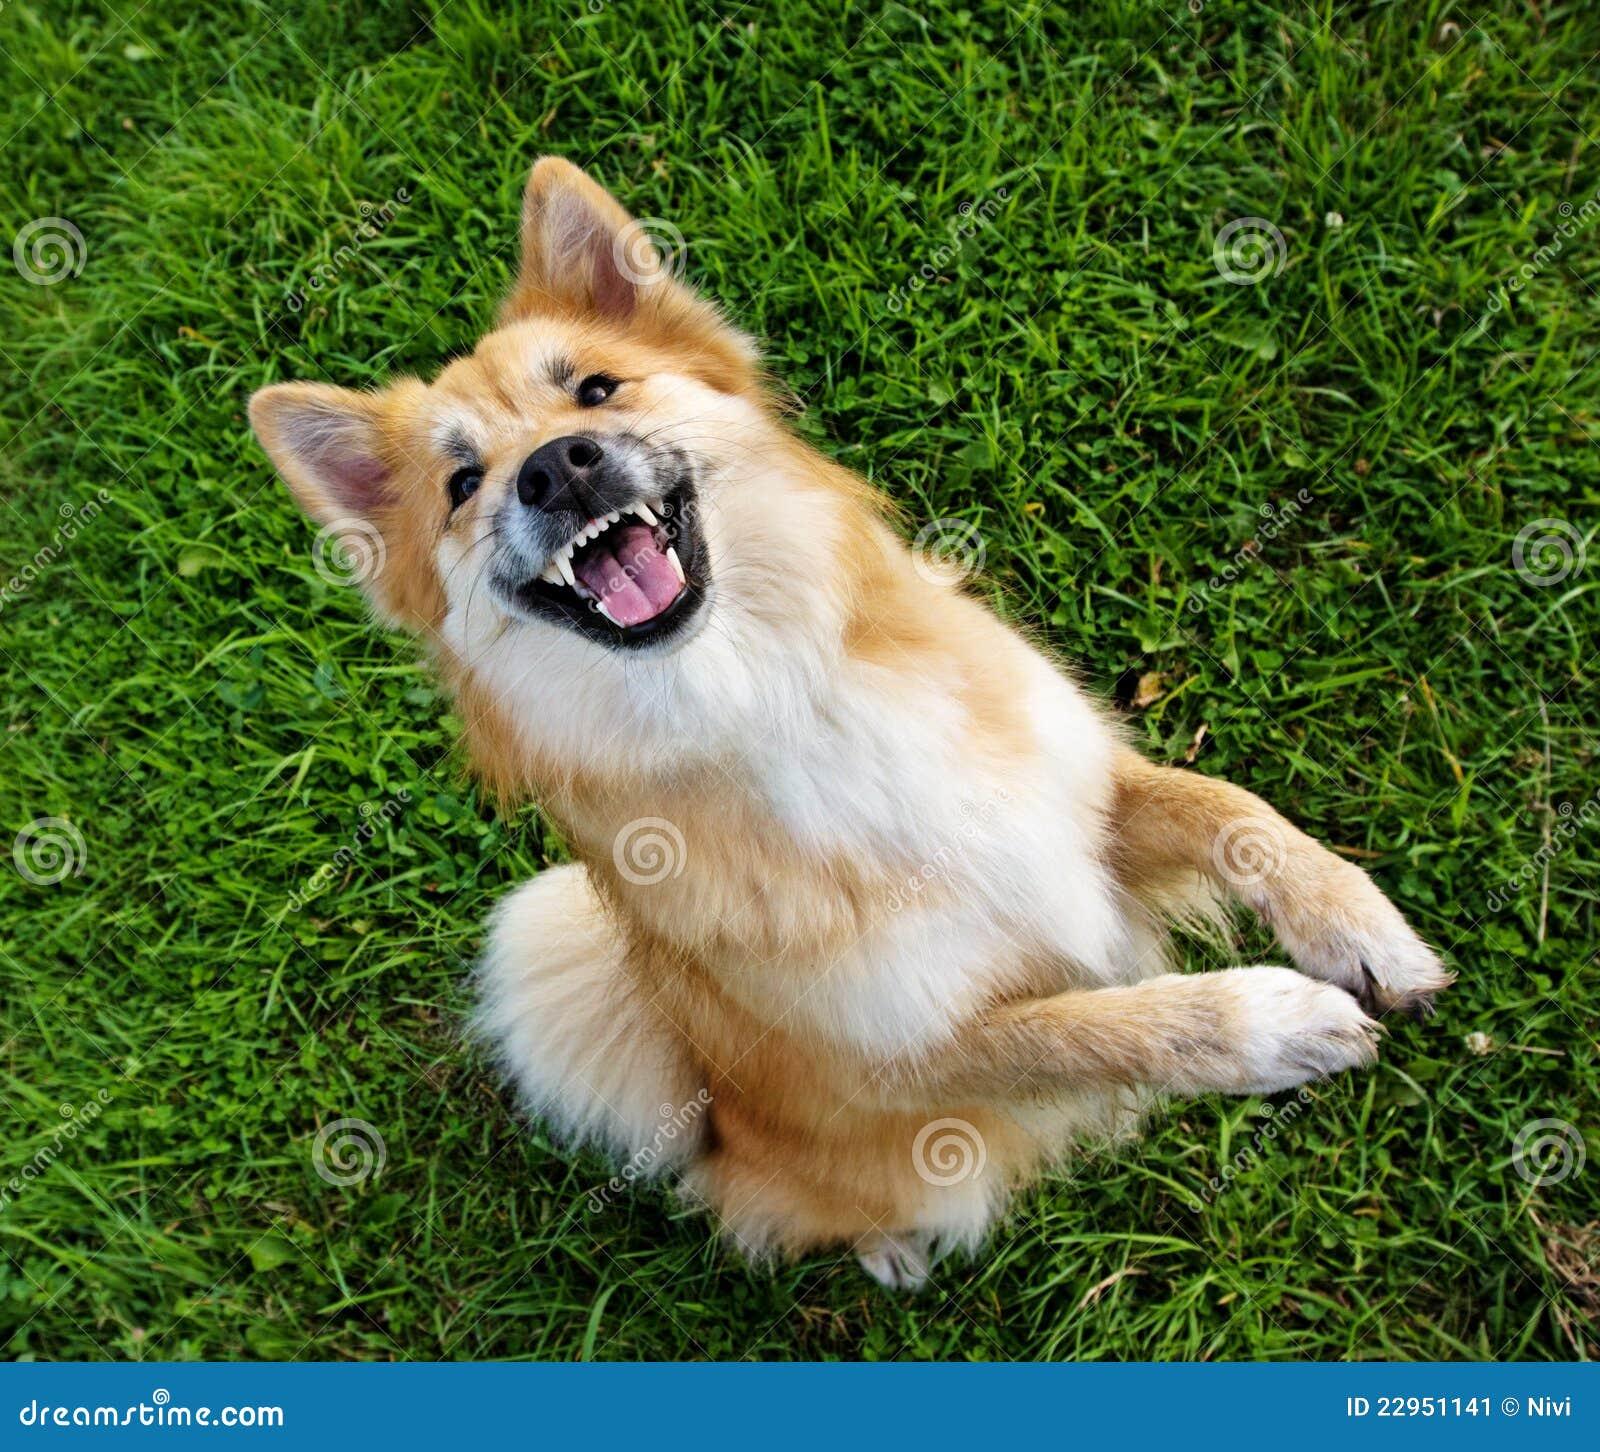 begging-dog-22951141.jpg